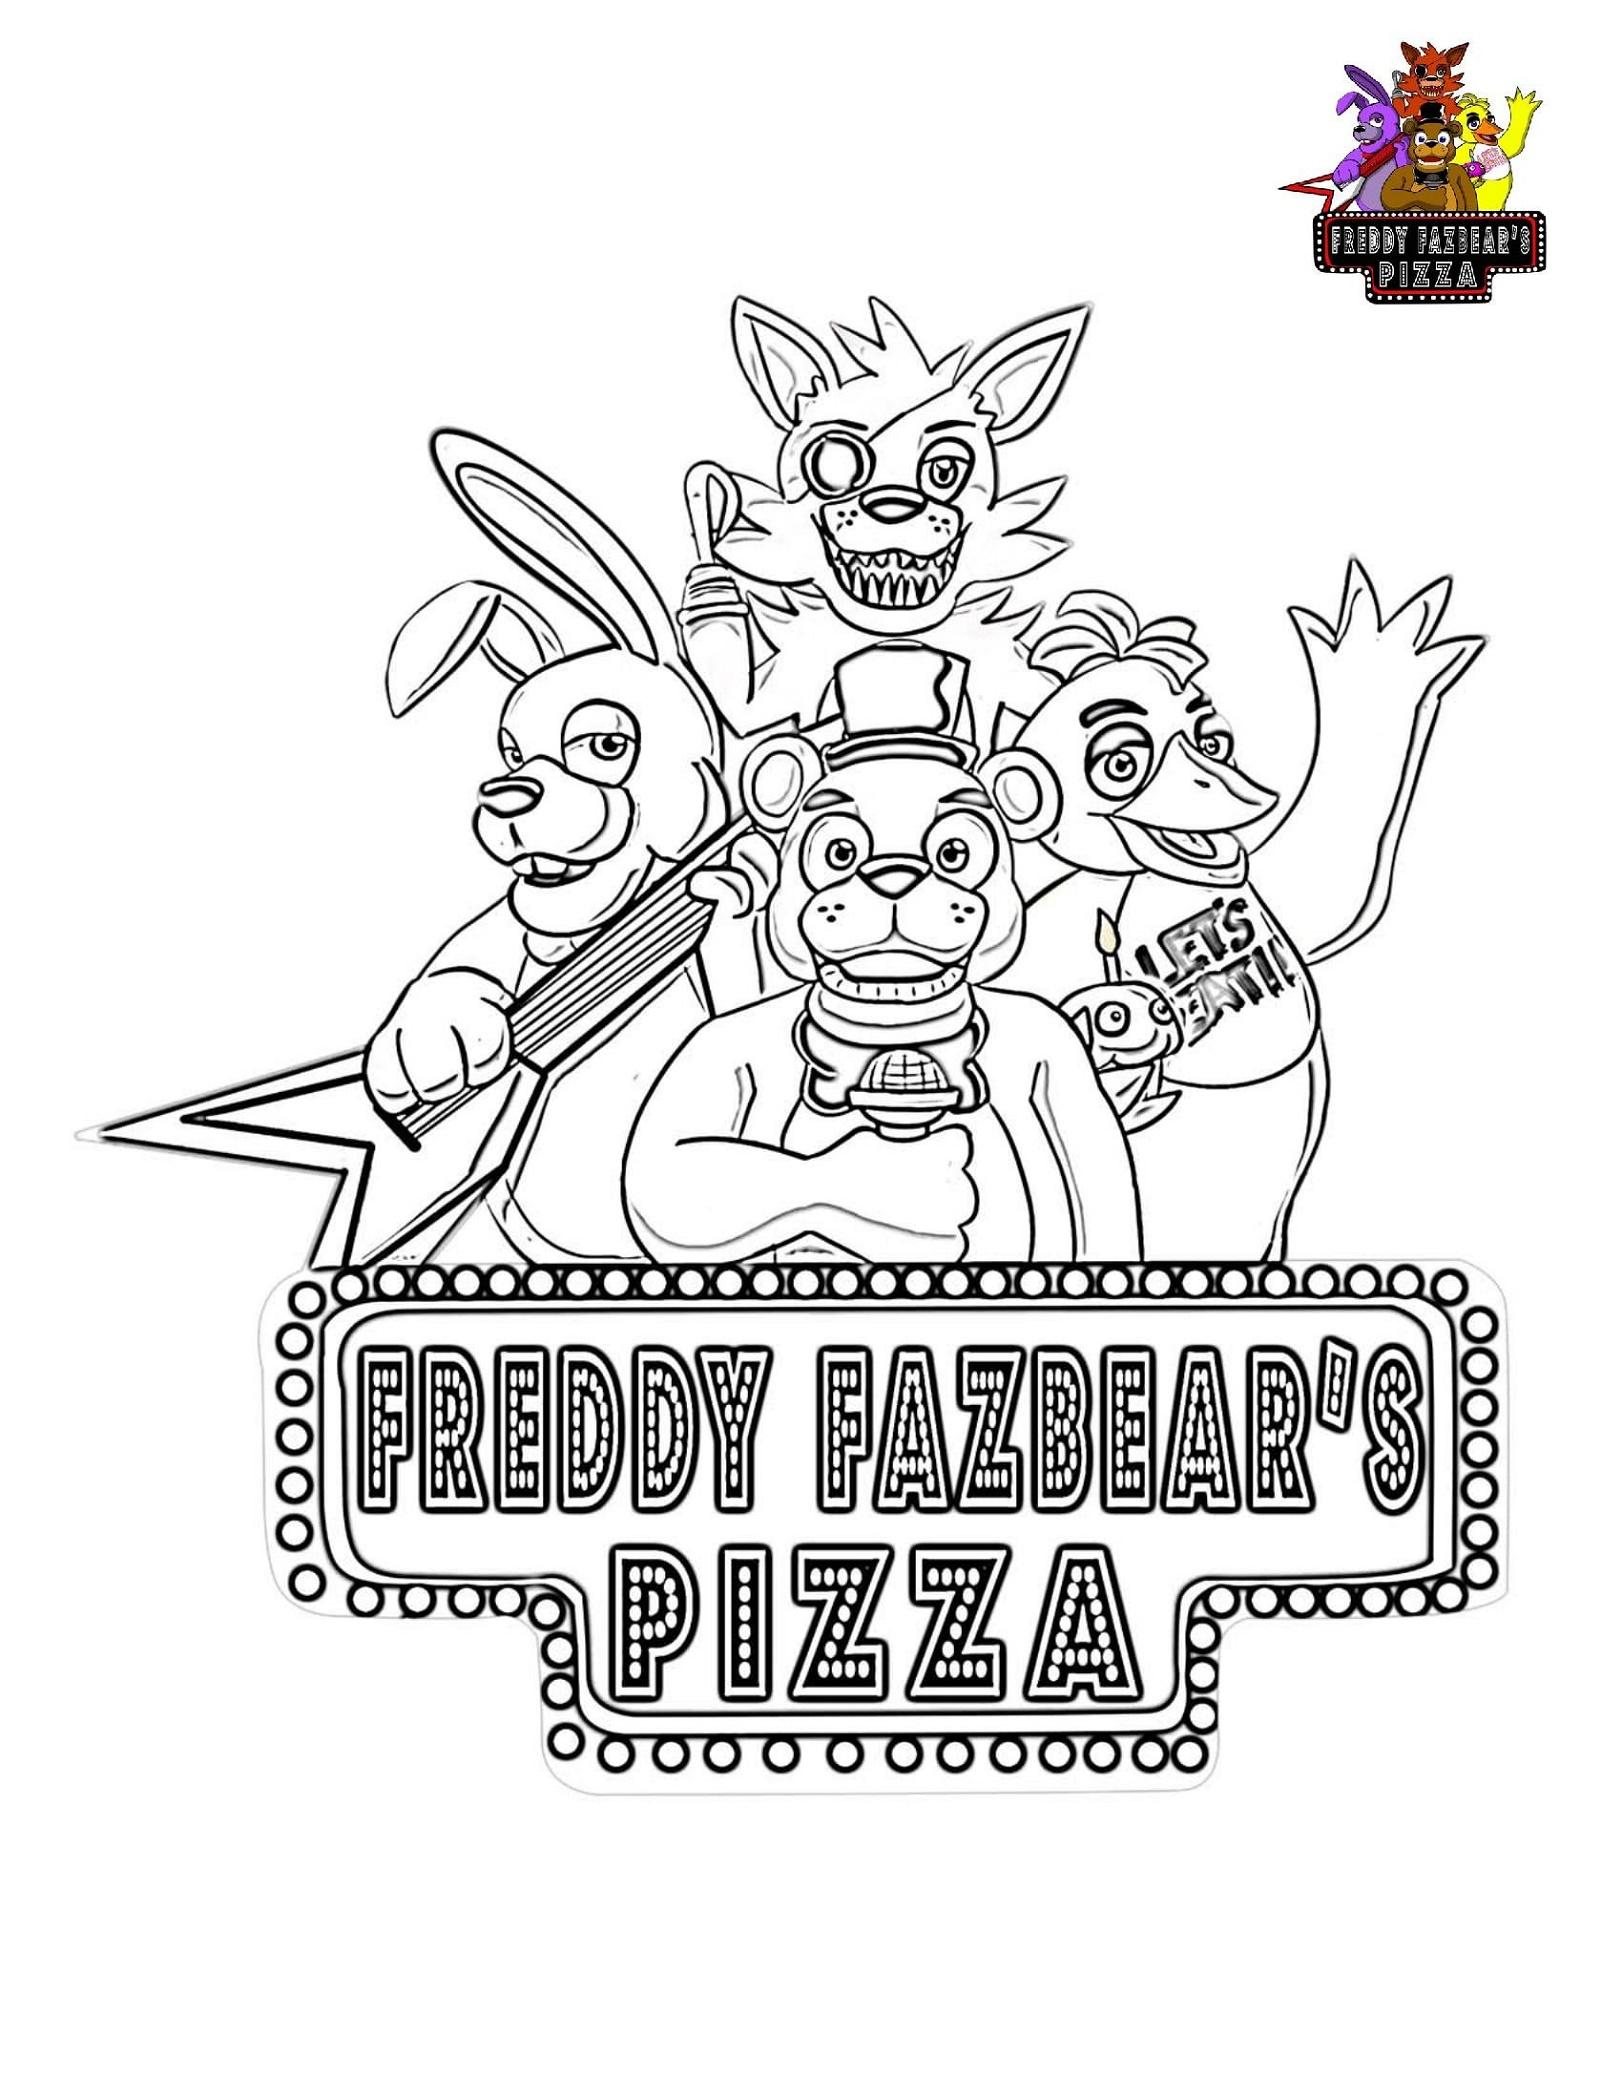 Five Nights At Freddy's Coloring Freddy Fazbear